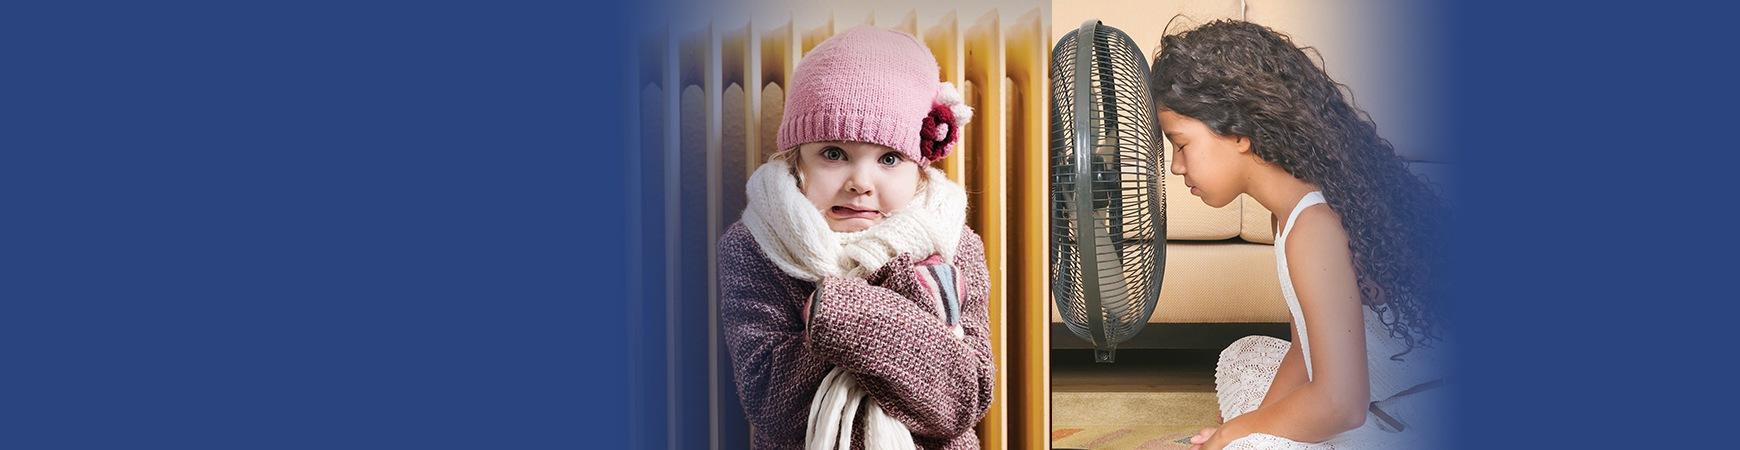 Hvac Home Heating Plumbing Hb Mcclure Harrisburg Pa